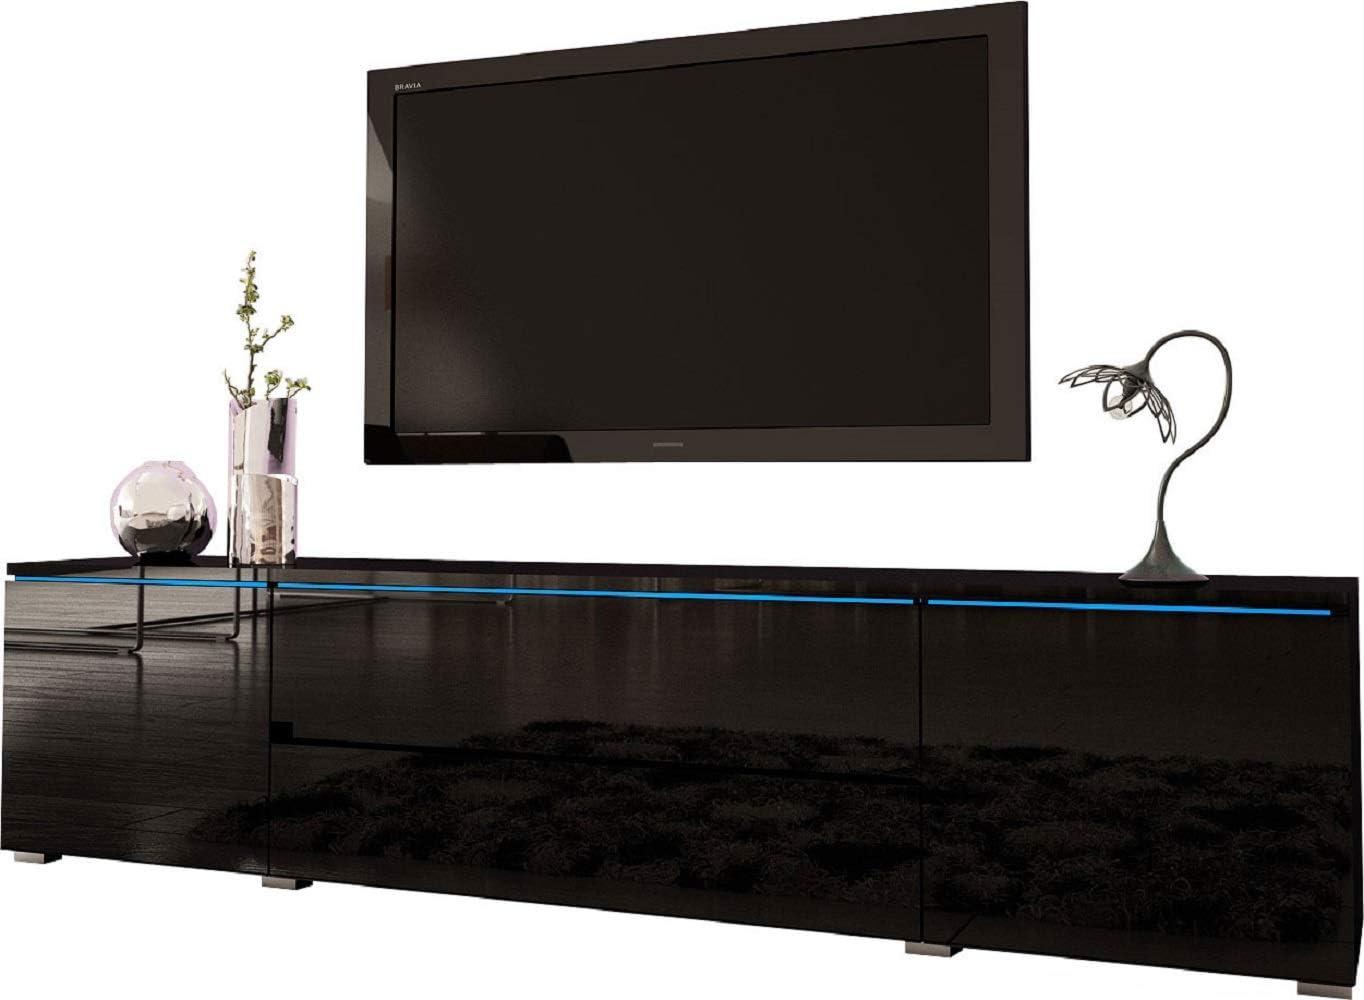 MEBLE FURNITURE RUGS Euphoria 79 Modern TV Stand Black